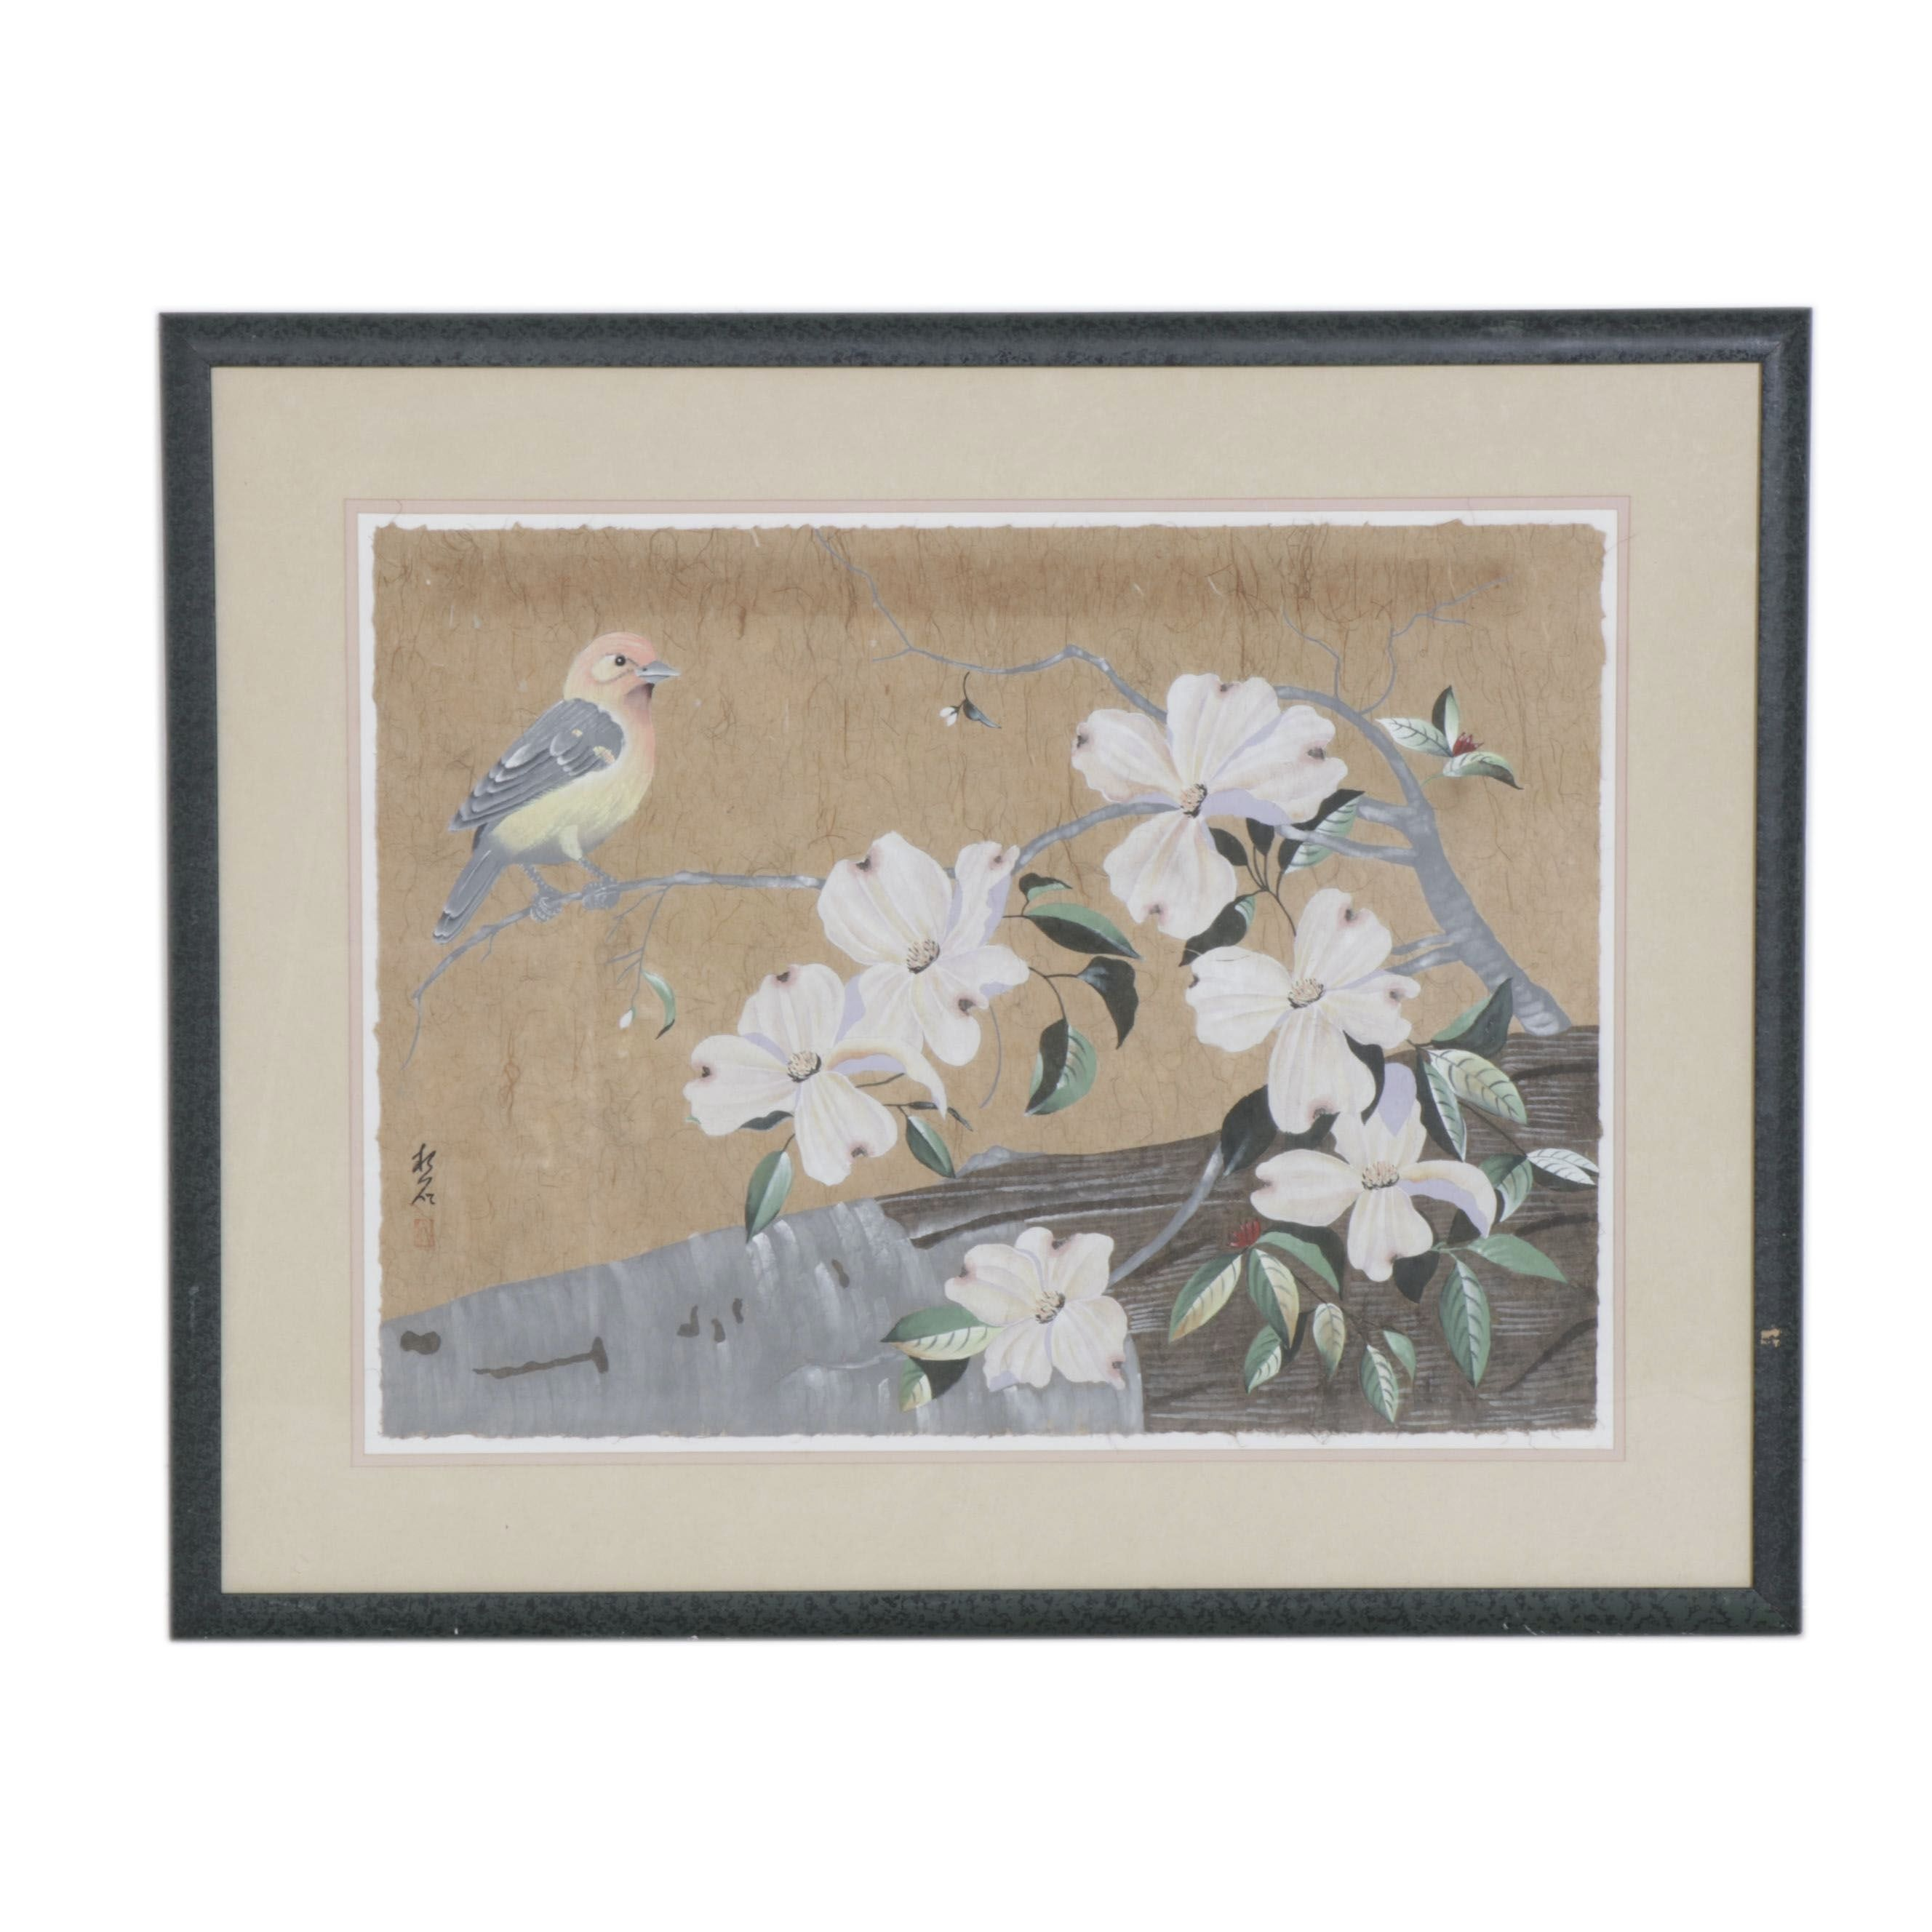 Chinese Gouache Painting on Handmade Paper